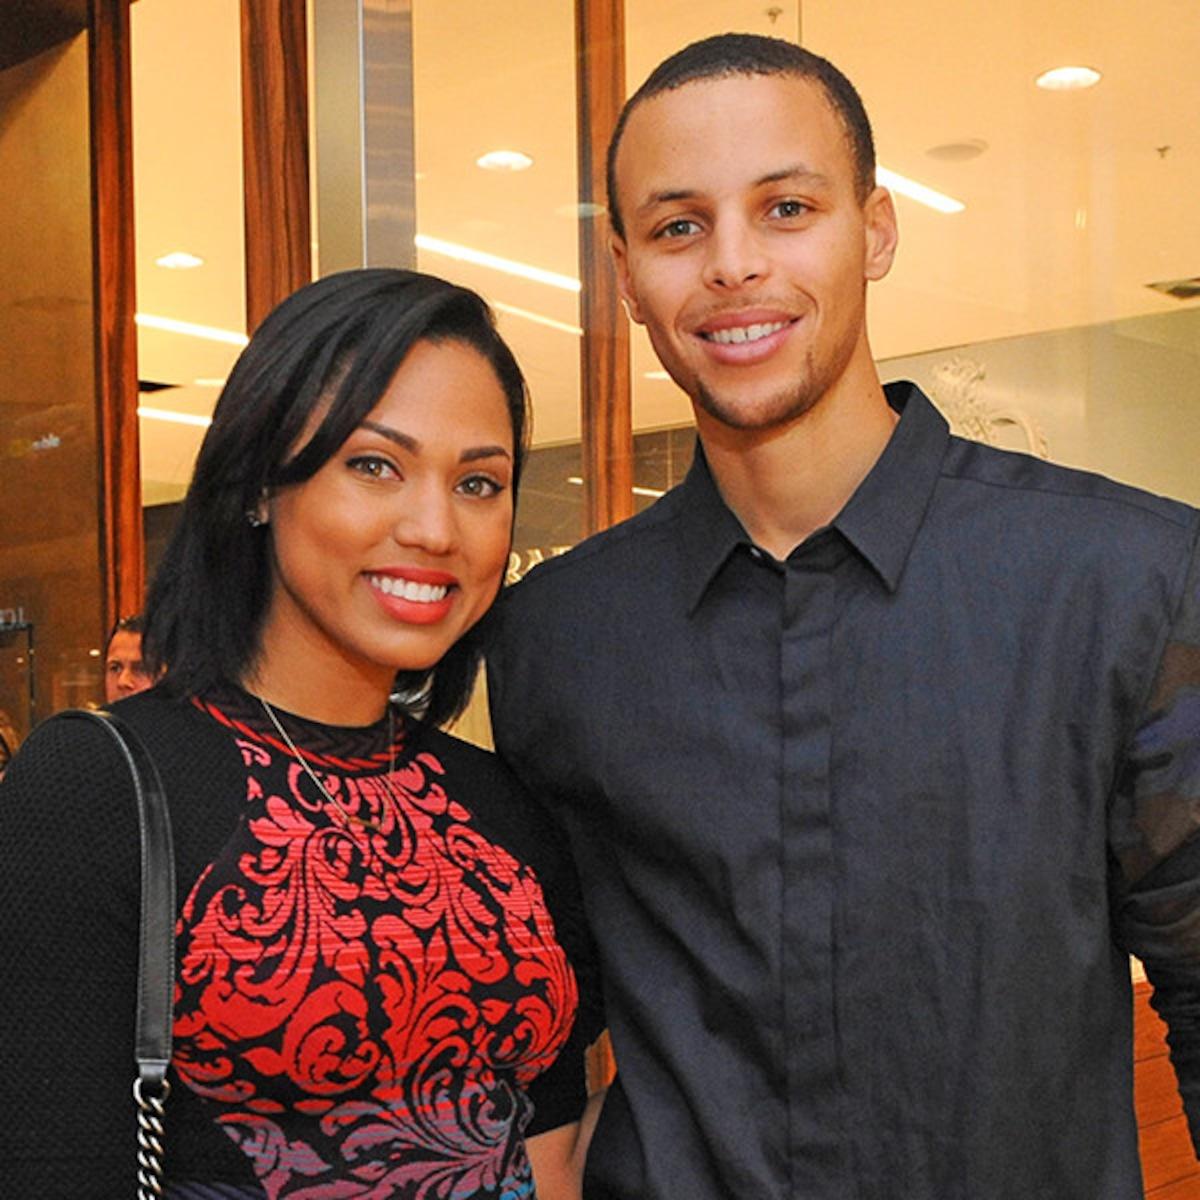 Stephen Curry Wife Ayesha